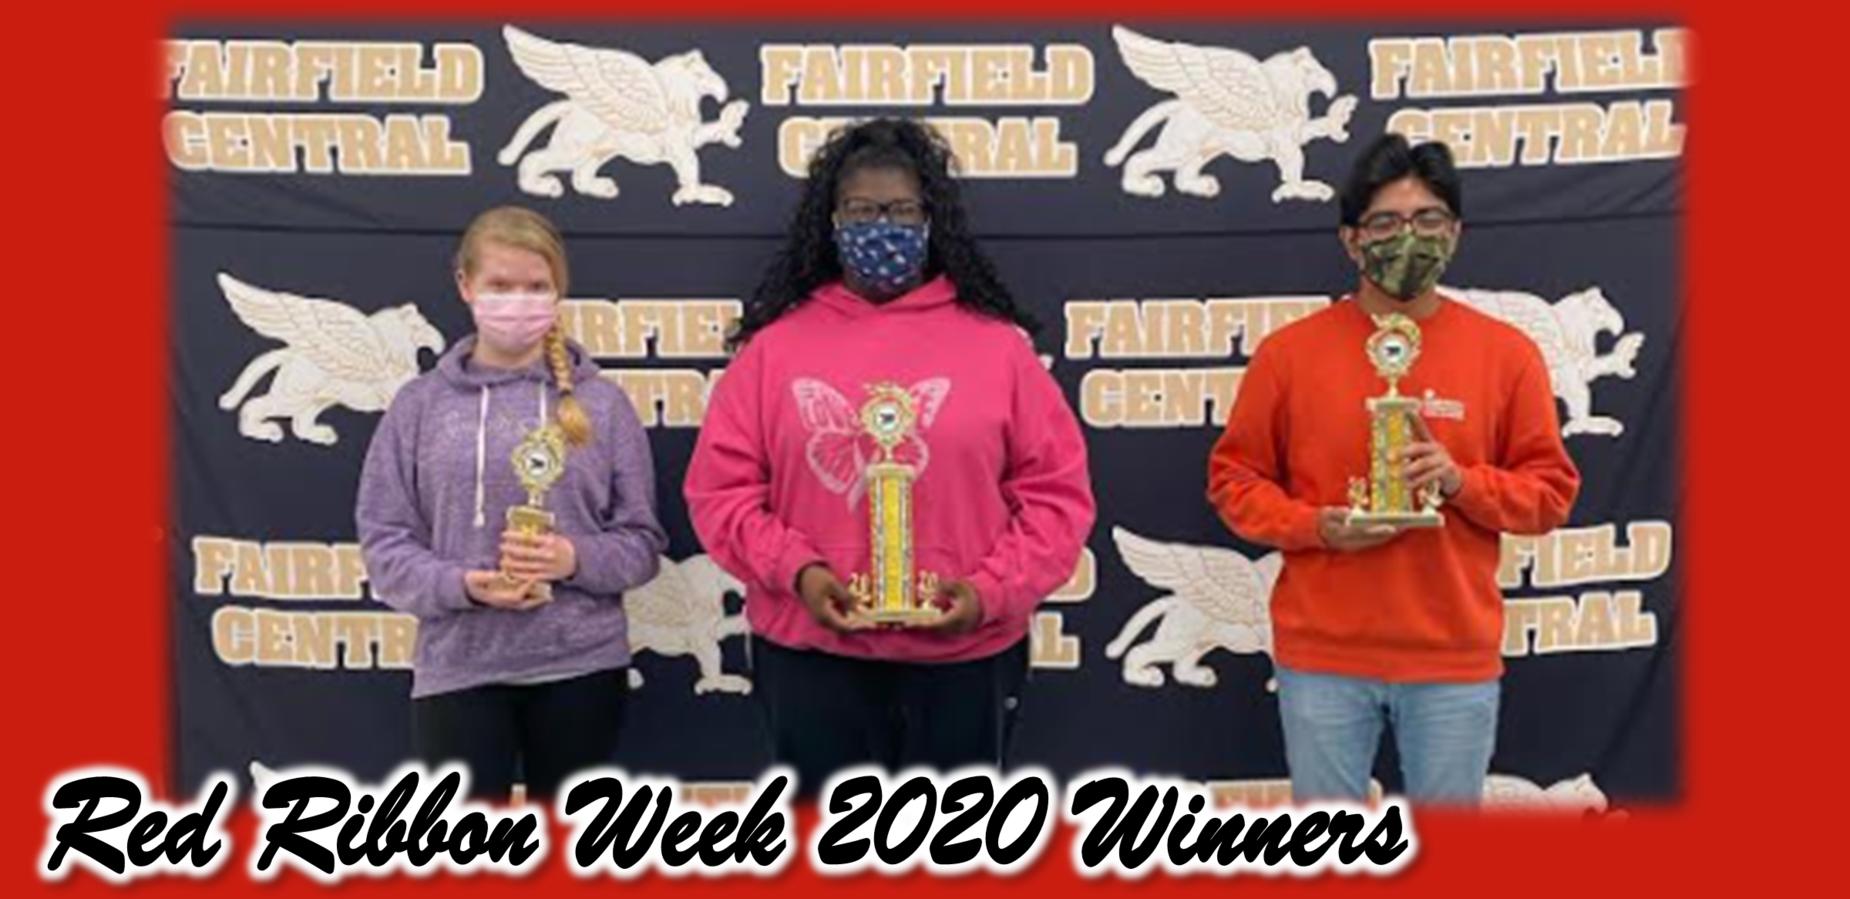 Red Ribbon Week 2020 Winners